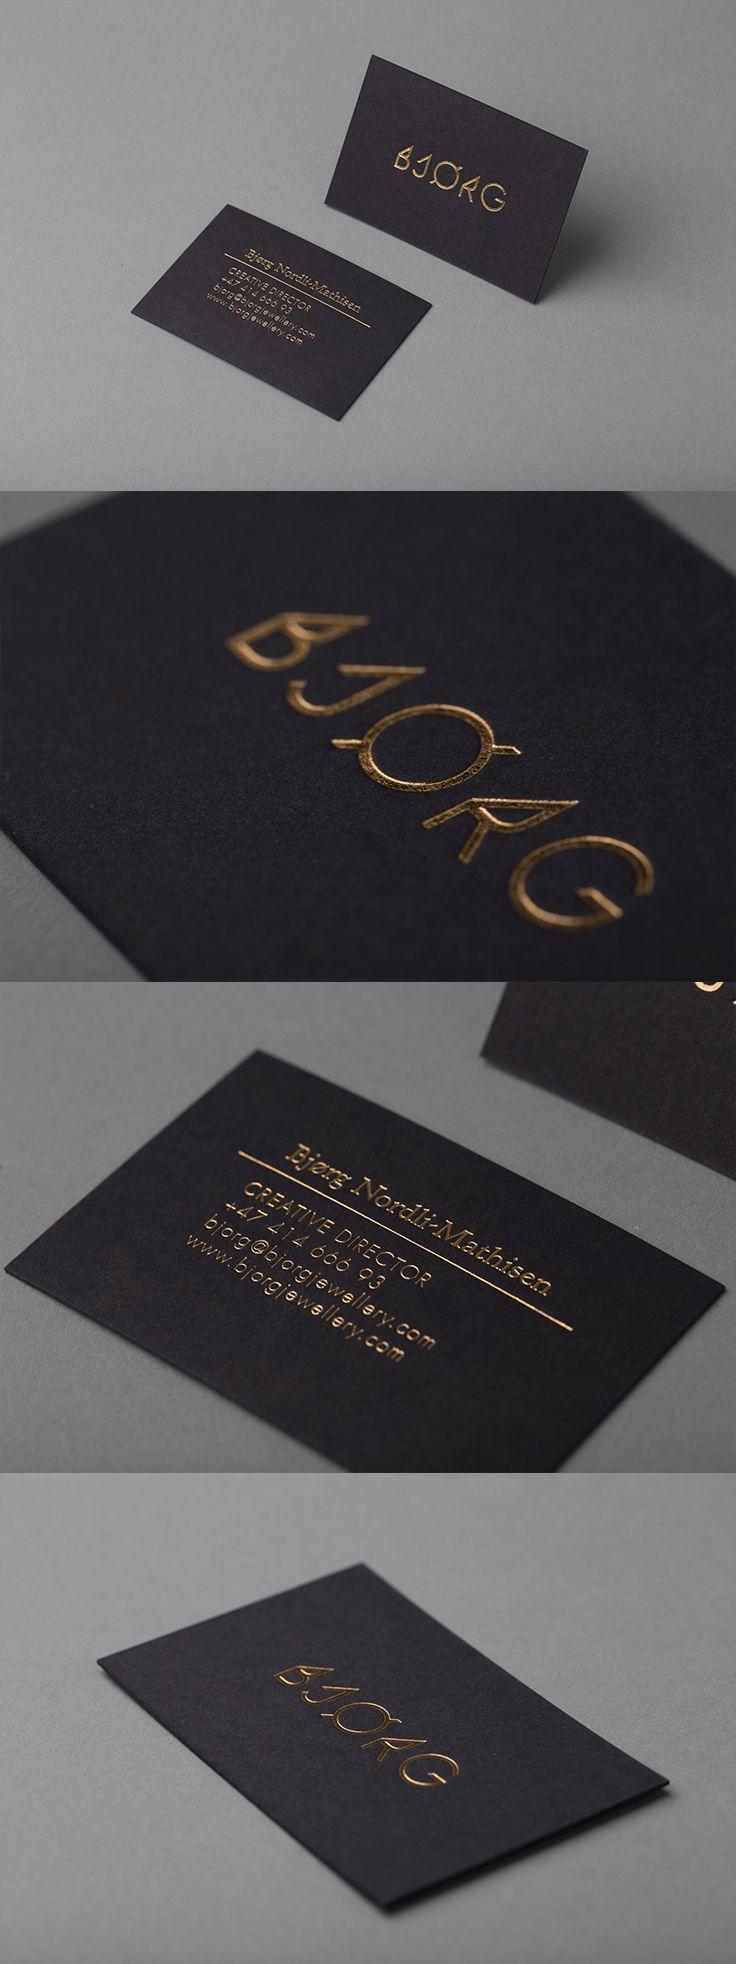 BJØRG - Visittkort med foliepreg på sort kartong.  #visittkort